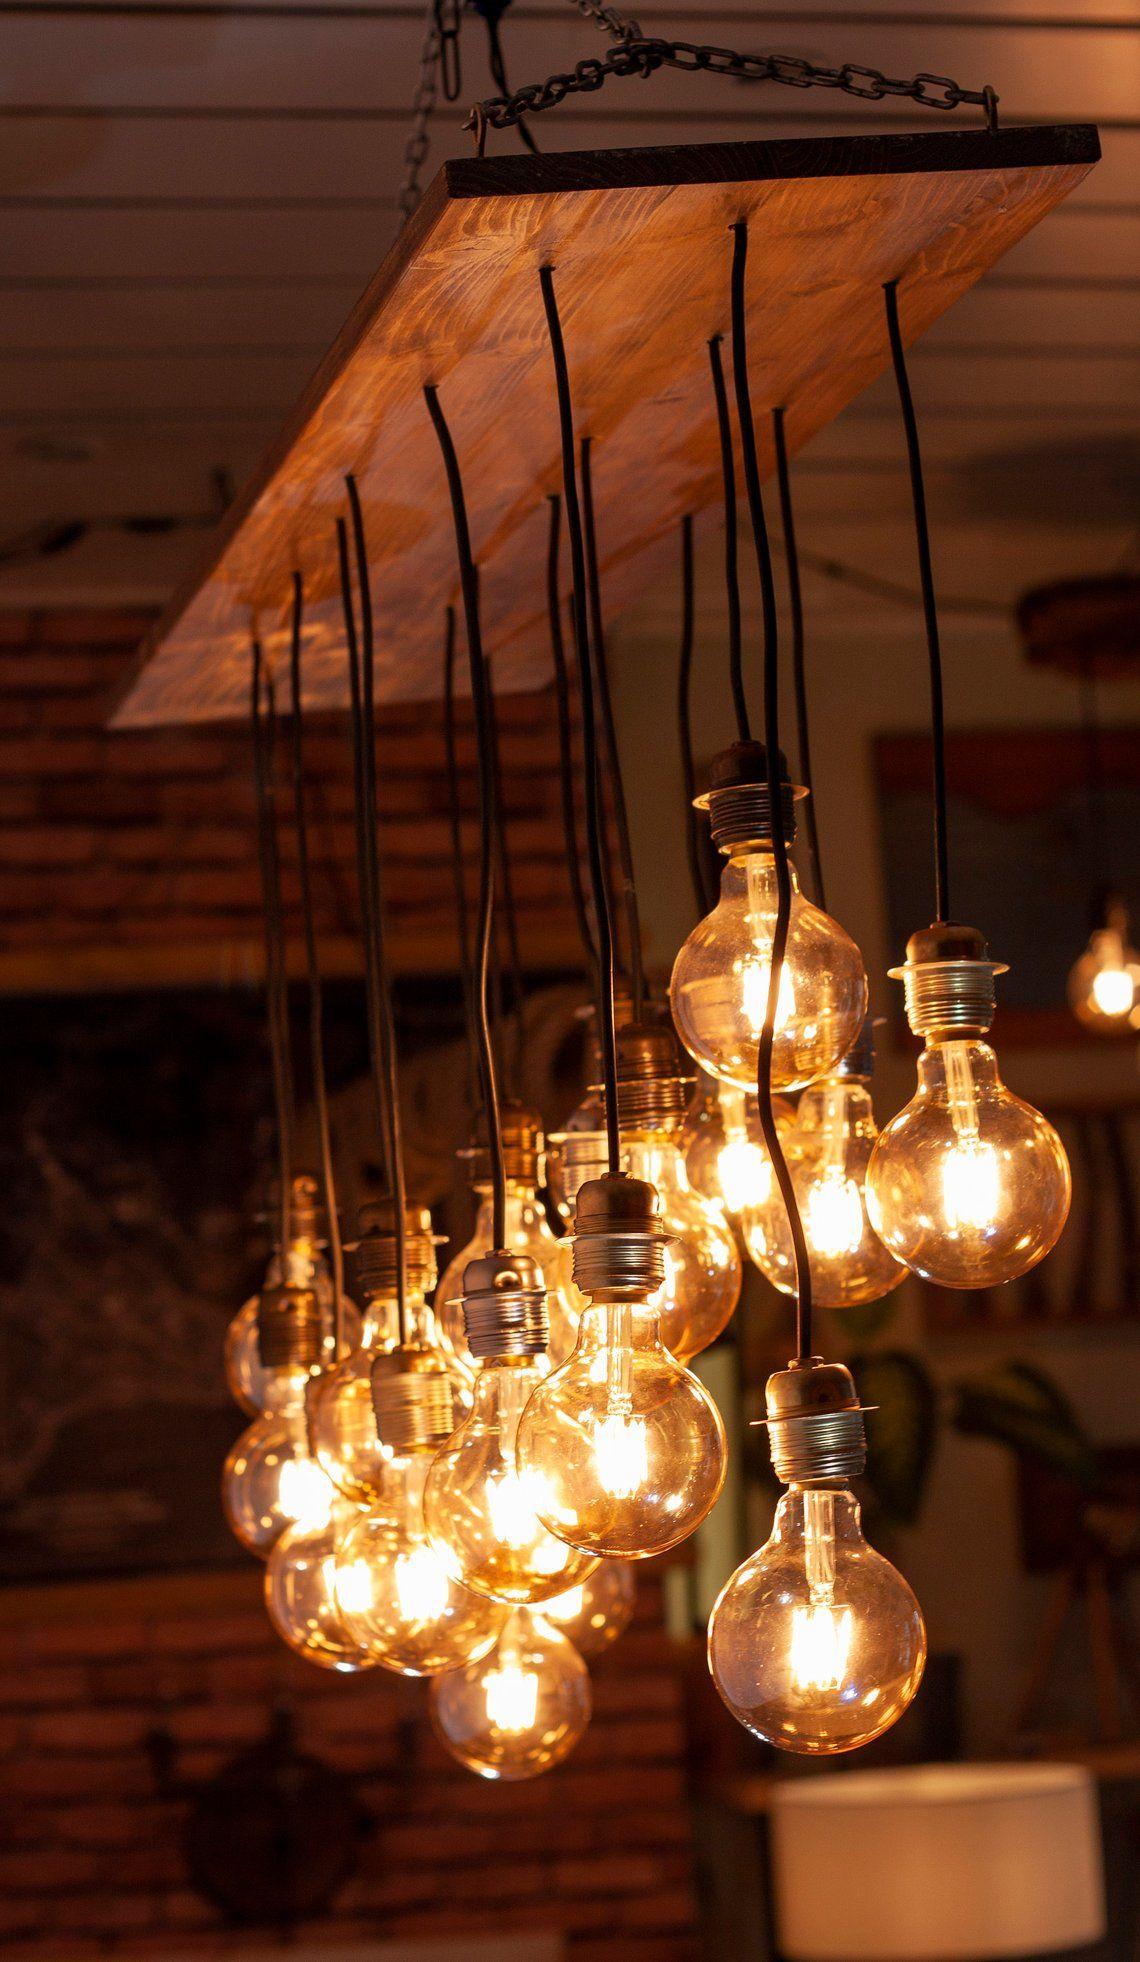 6b629752314b7 Reclaimed Farmhouse Lighting Fixture, Chandelier, Rustic Pendant ...